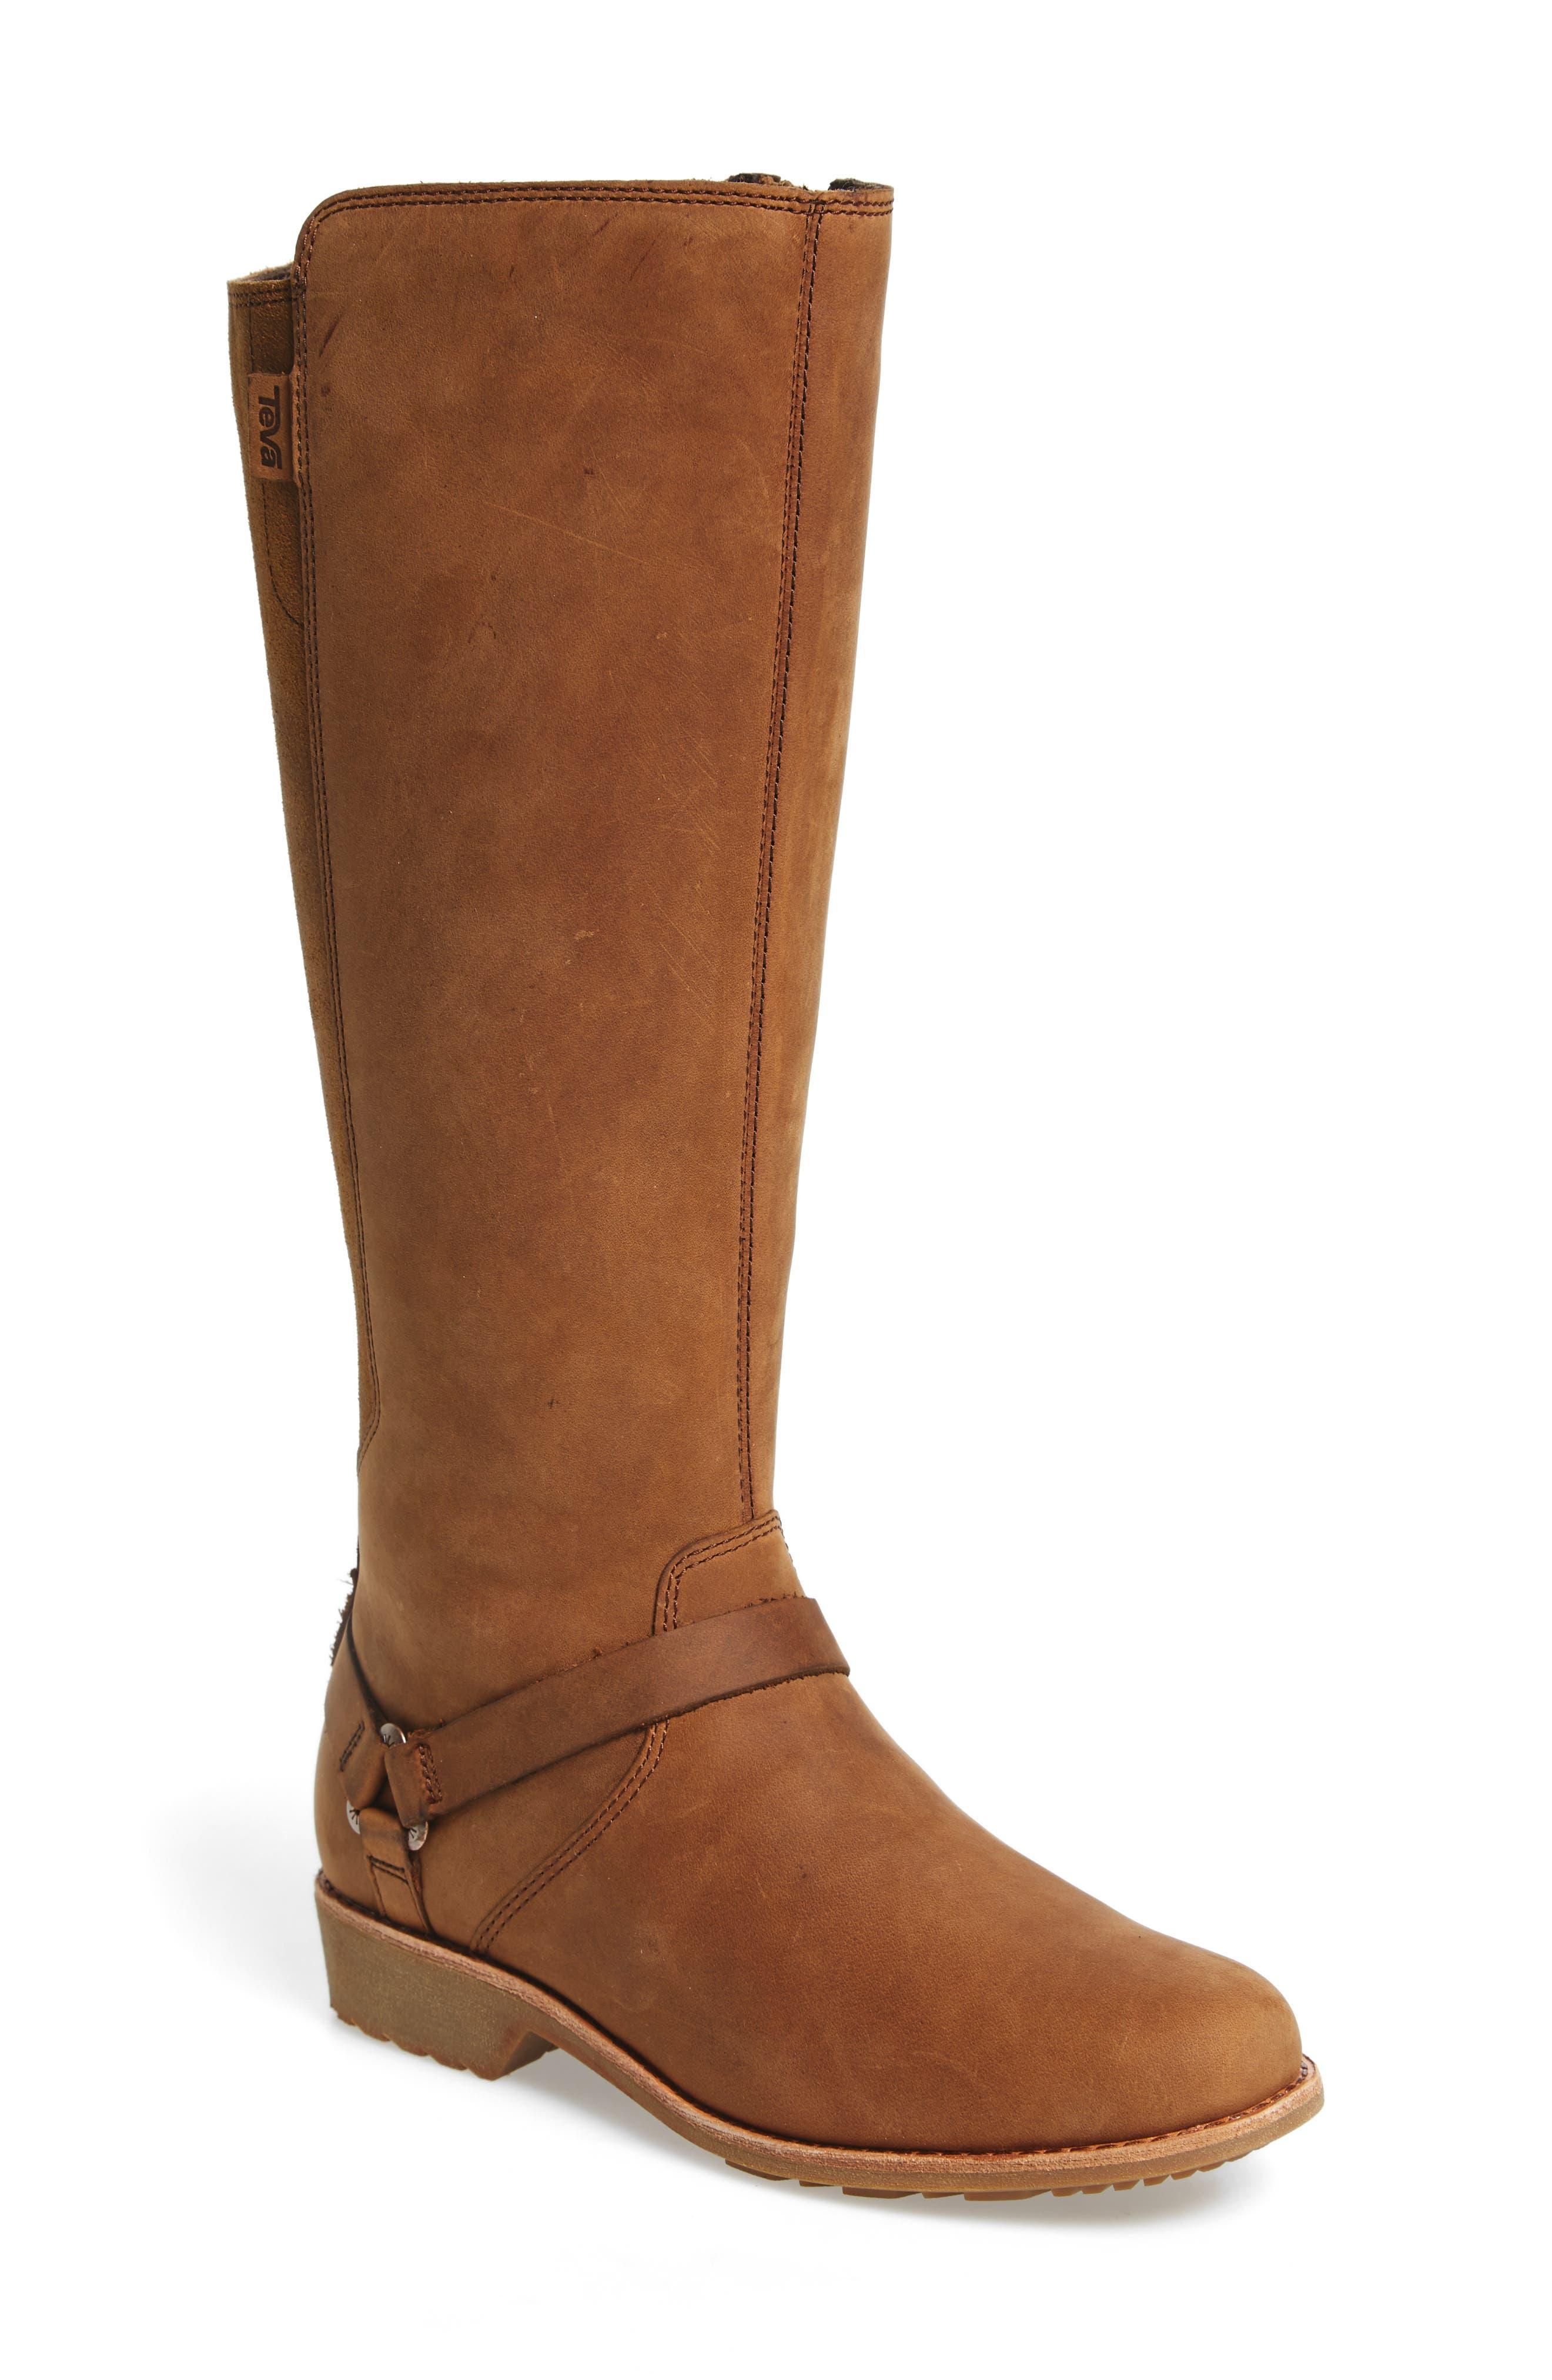 Main Image - Teva De La Vina Waterproof Boot (Women)